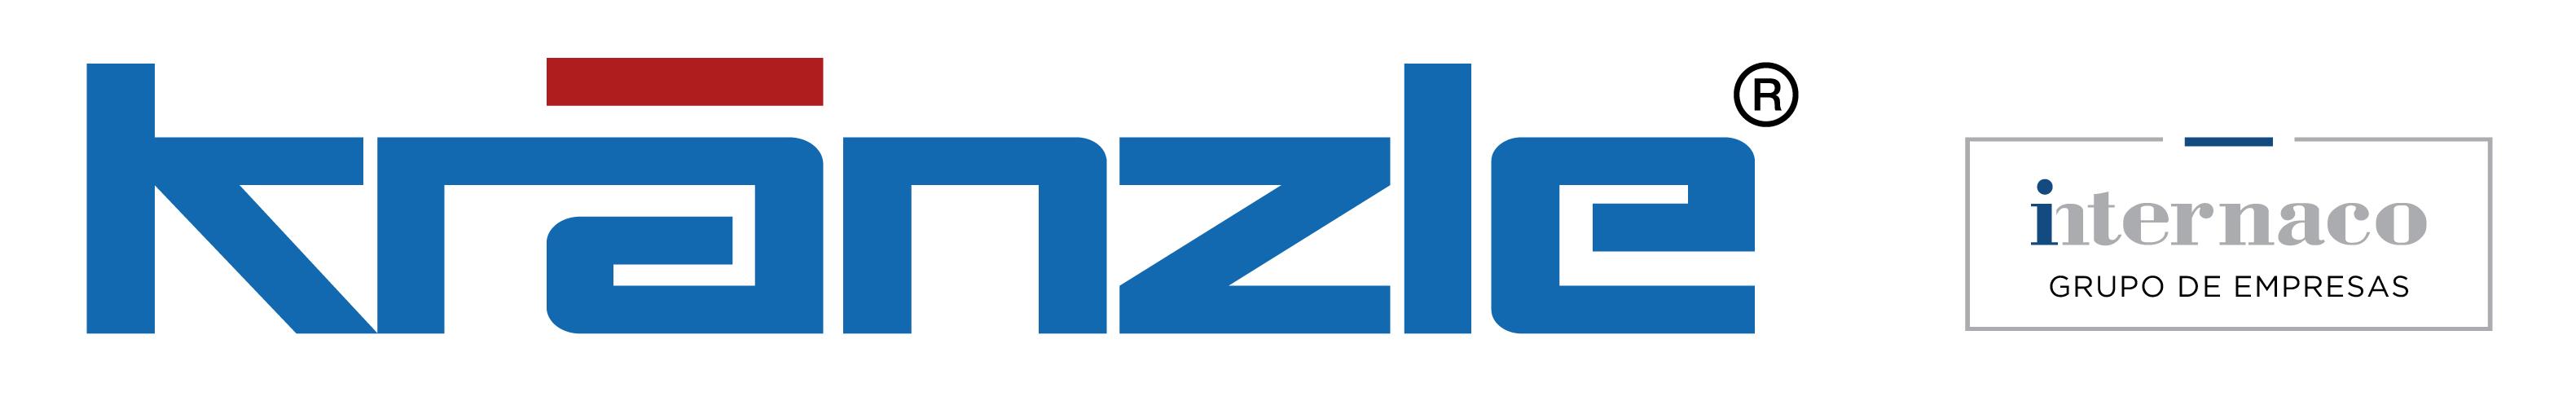 Logo Kranle Internaco